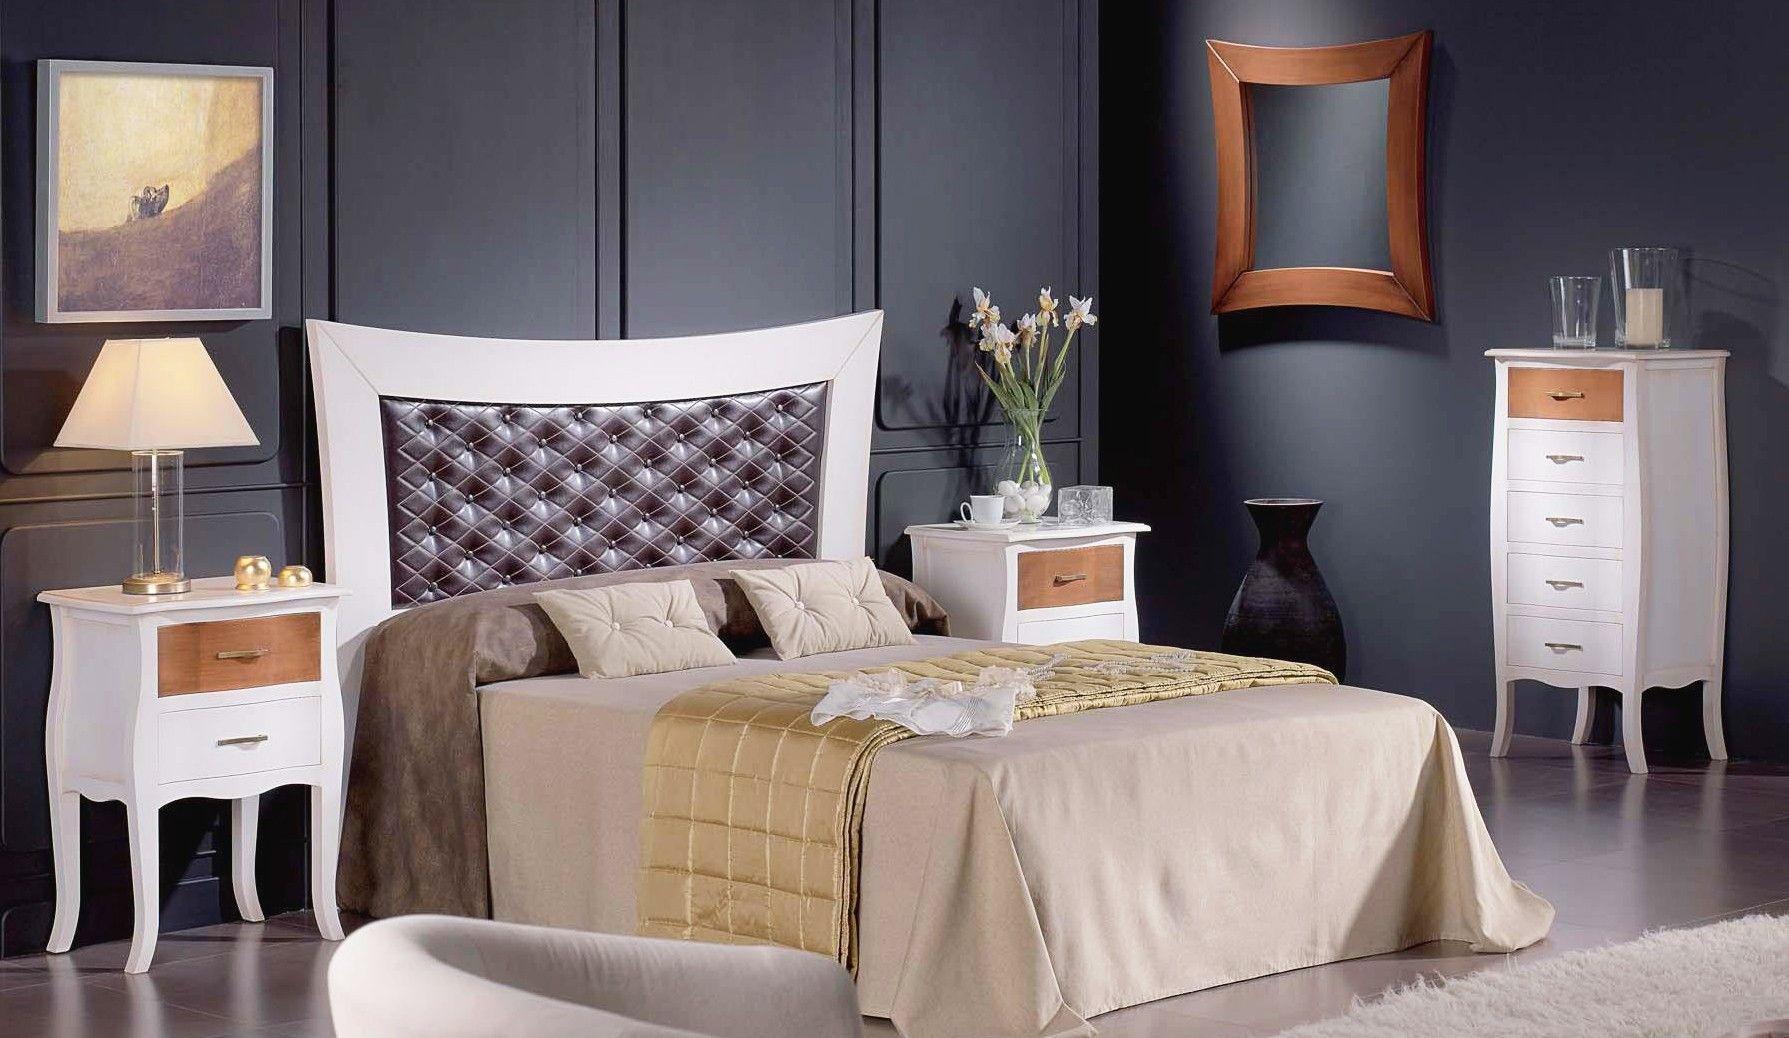 Dormitorio de matrimonio en madera de pino macizo, cabecero con ...